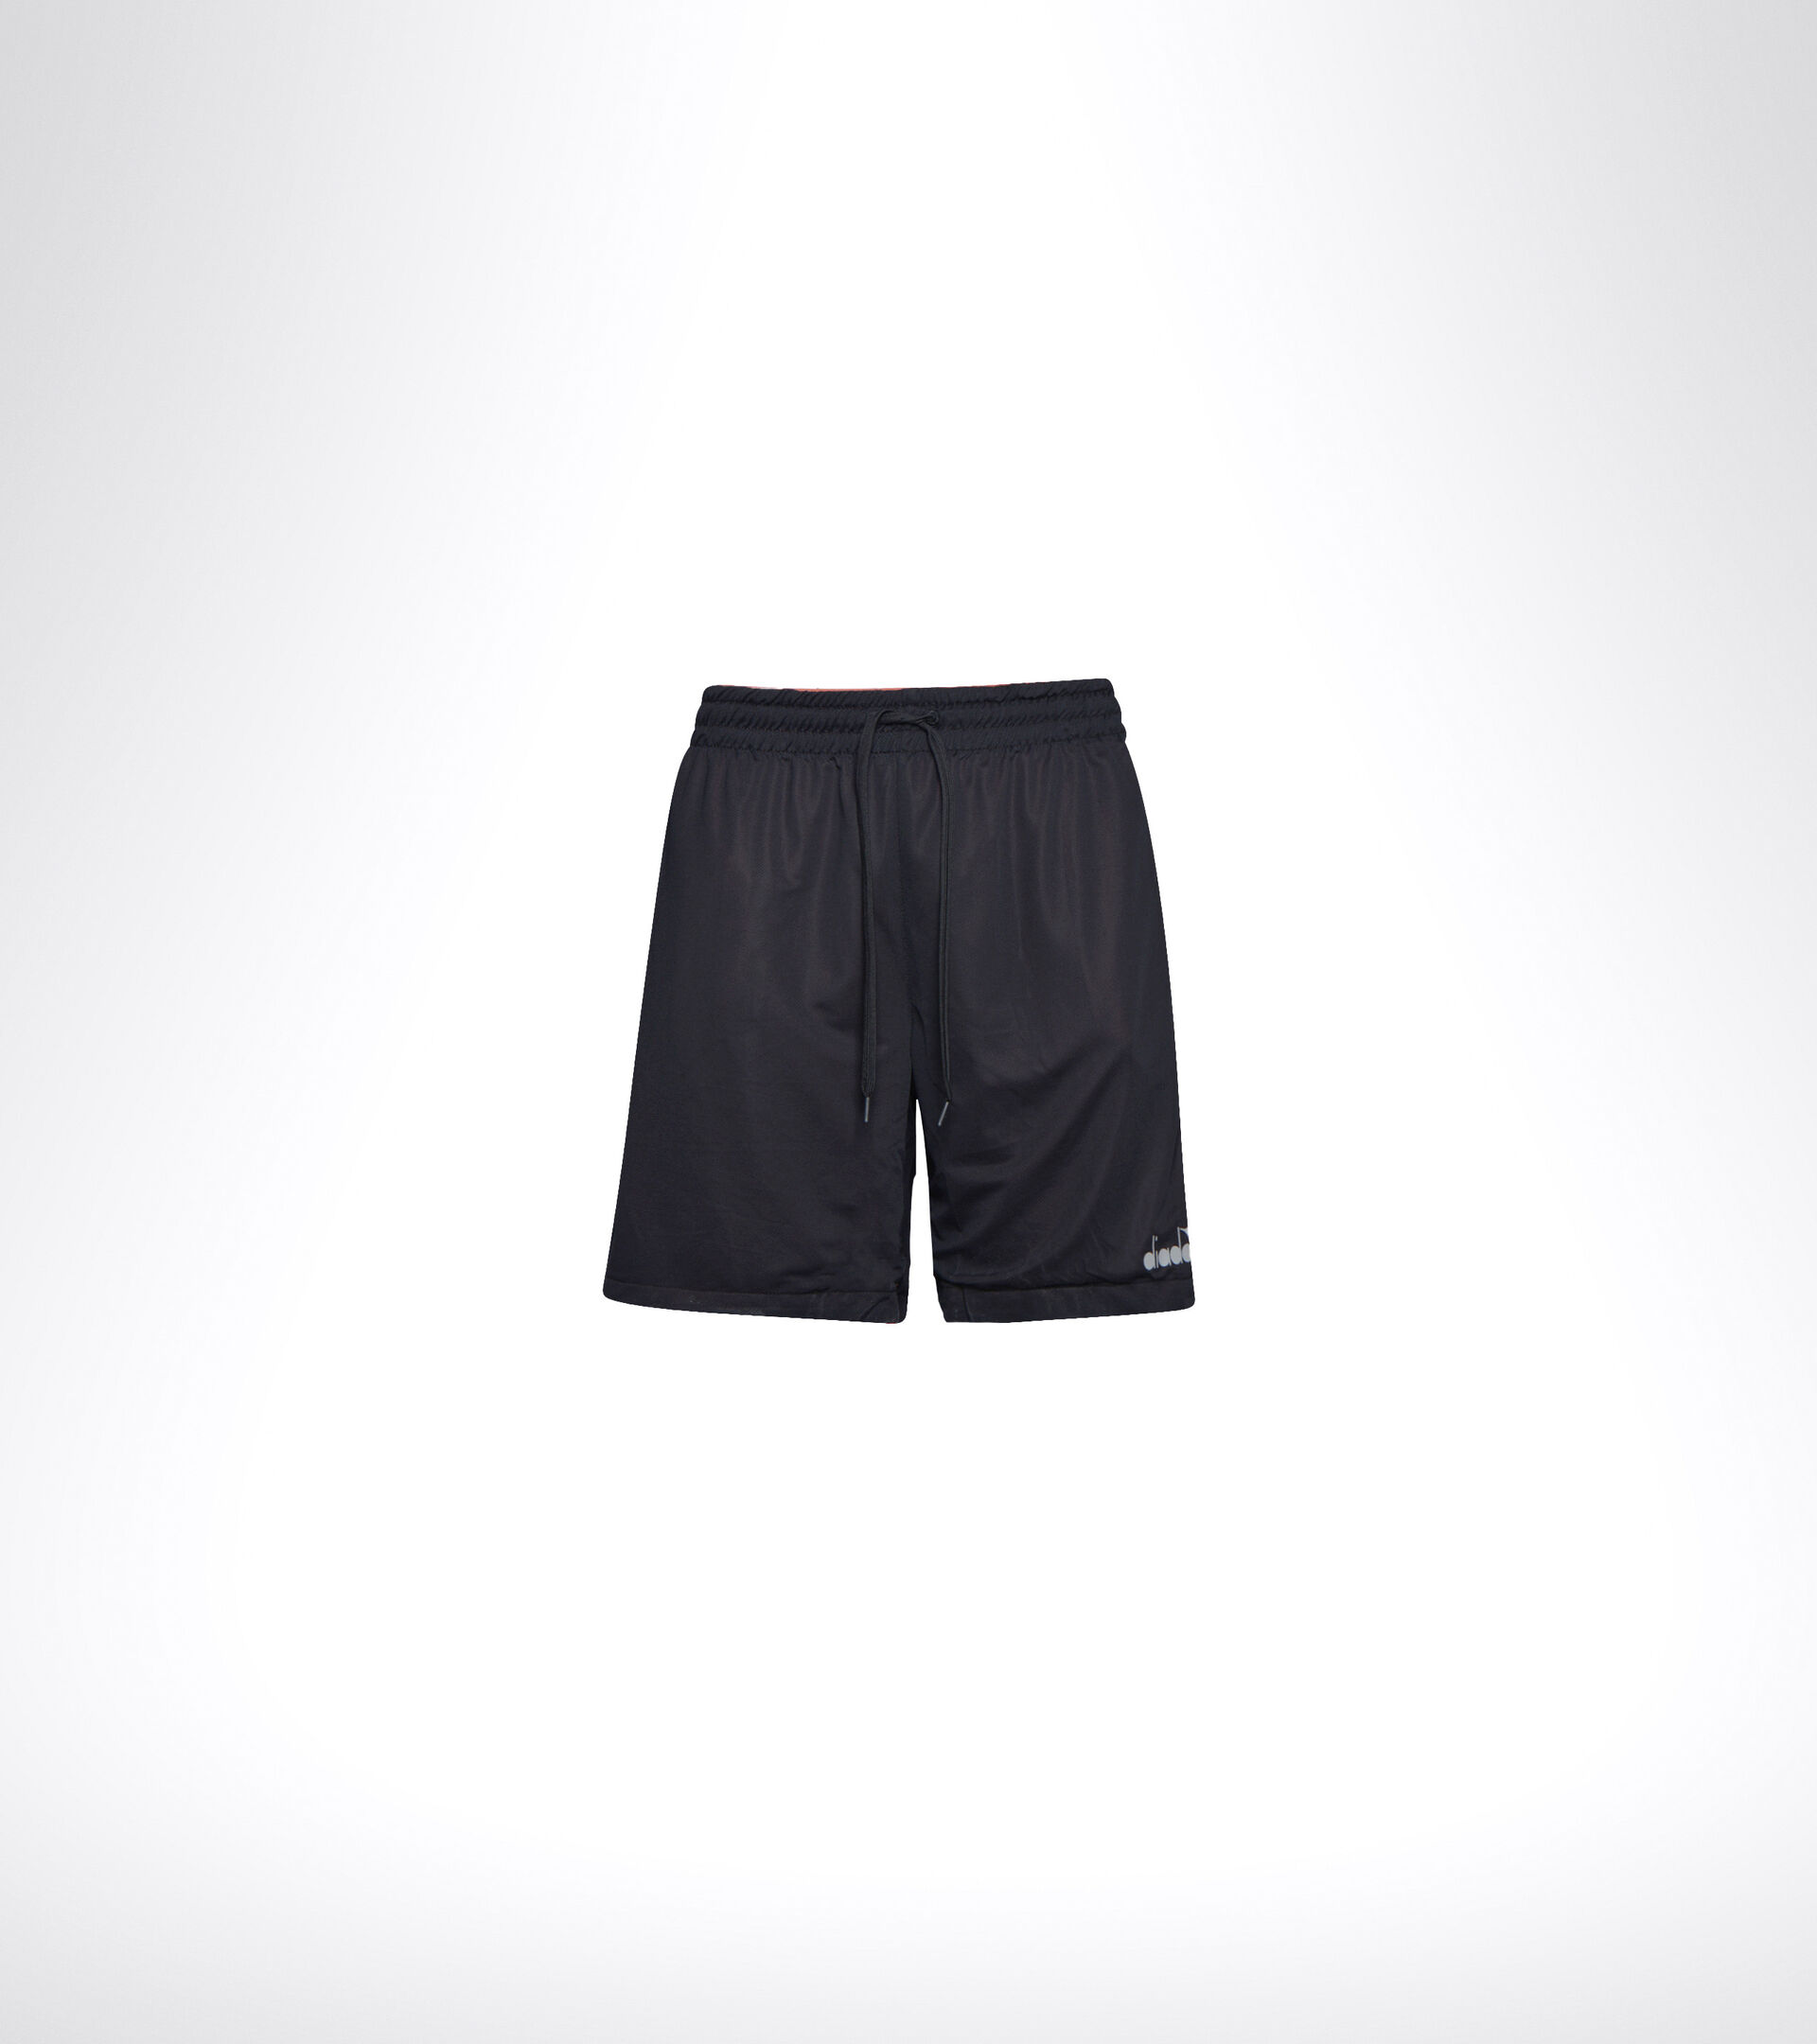 Shorts para correr - Hombrer BERMUDA REVERSIBLE BE ONE MRRN ANARANJADO MECCA/NEGRO - Diadora